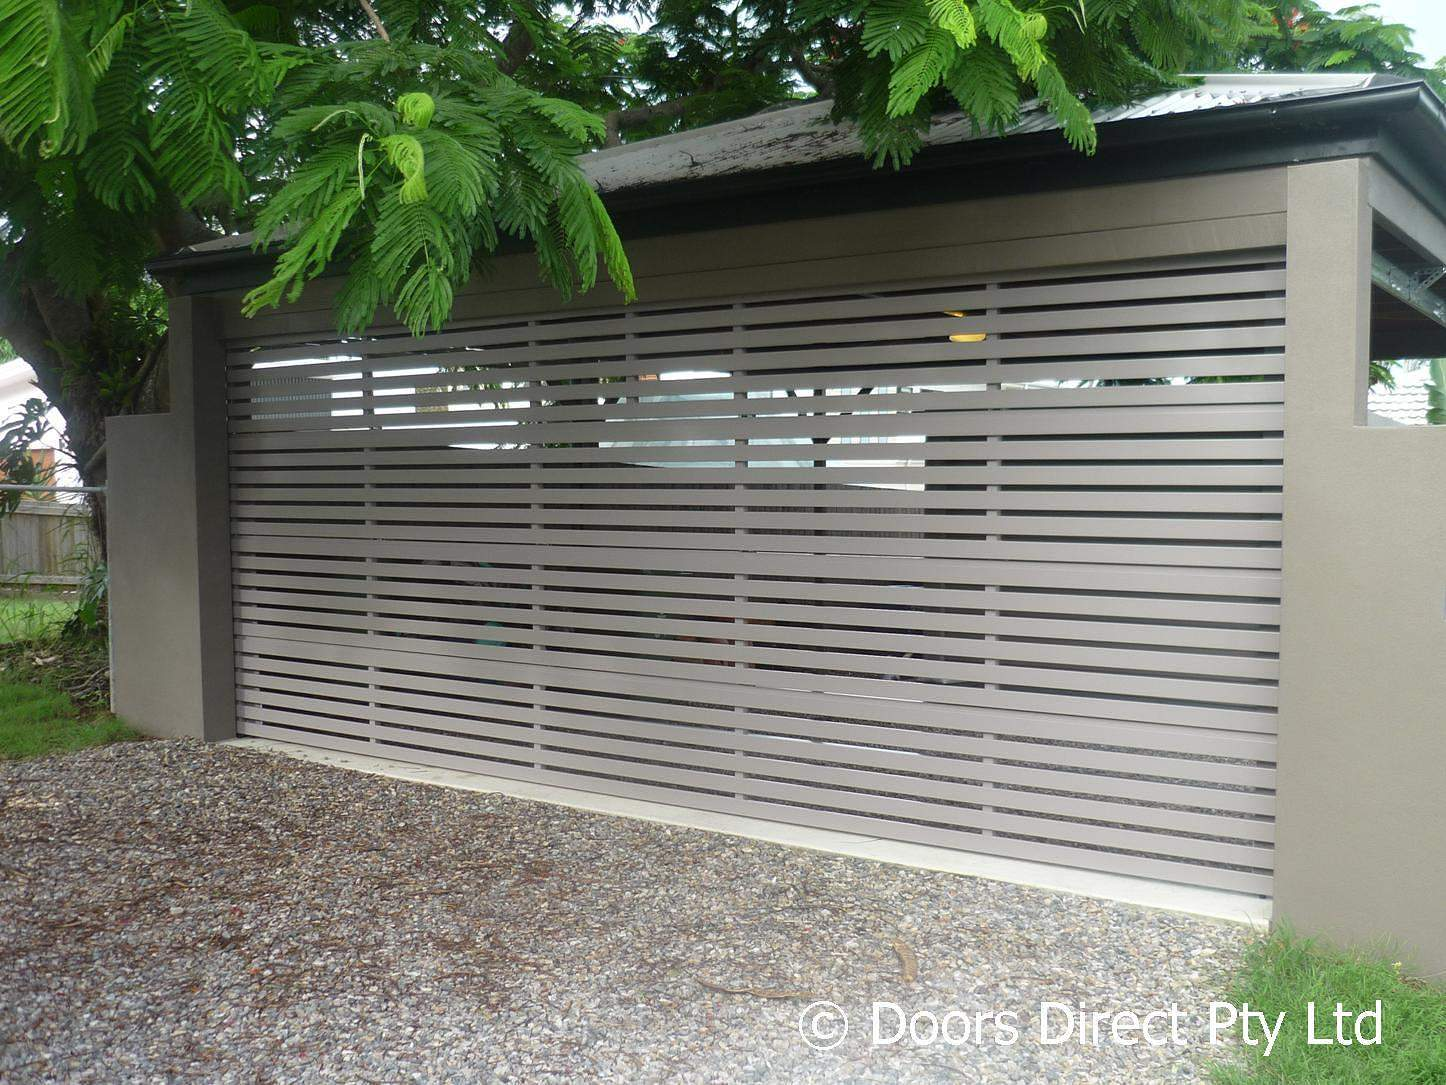 Garage Doors Brisbane: Make The Perfect Choice In Garage Doors: